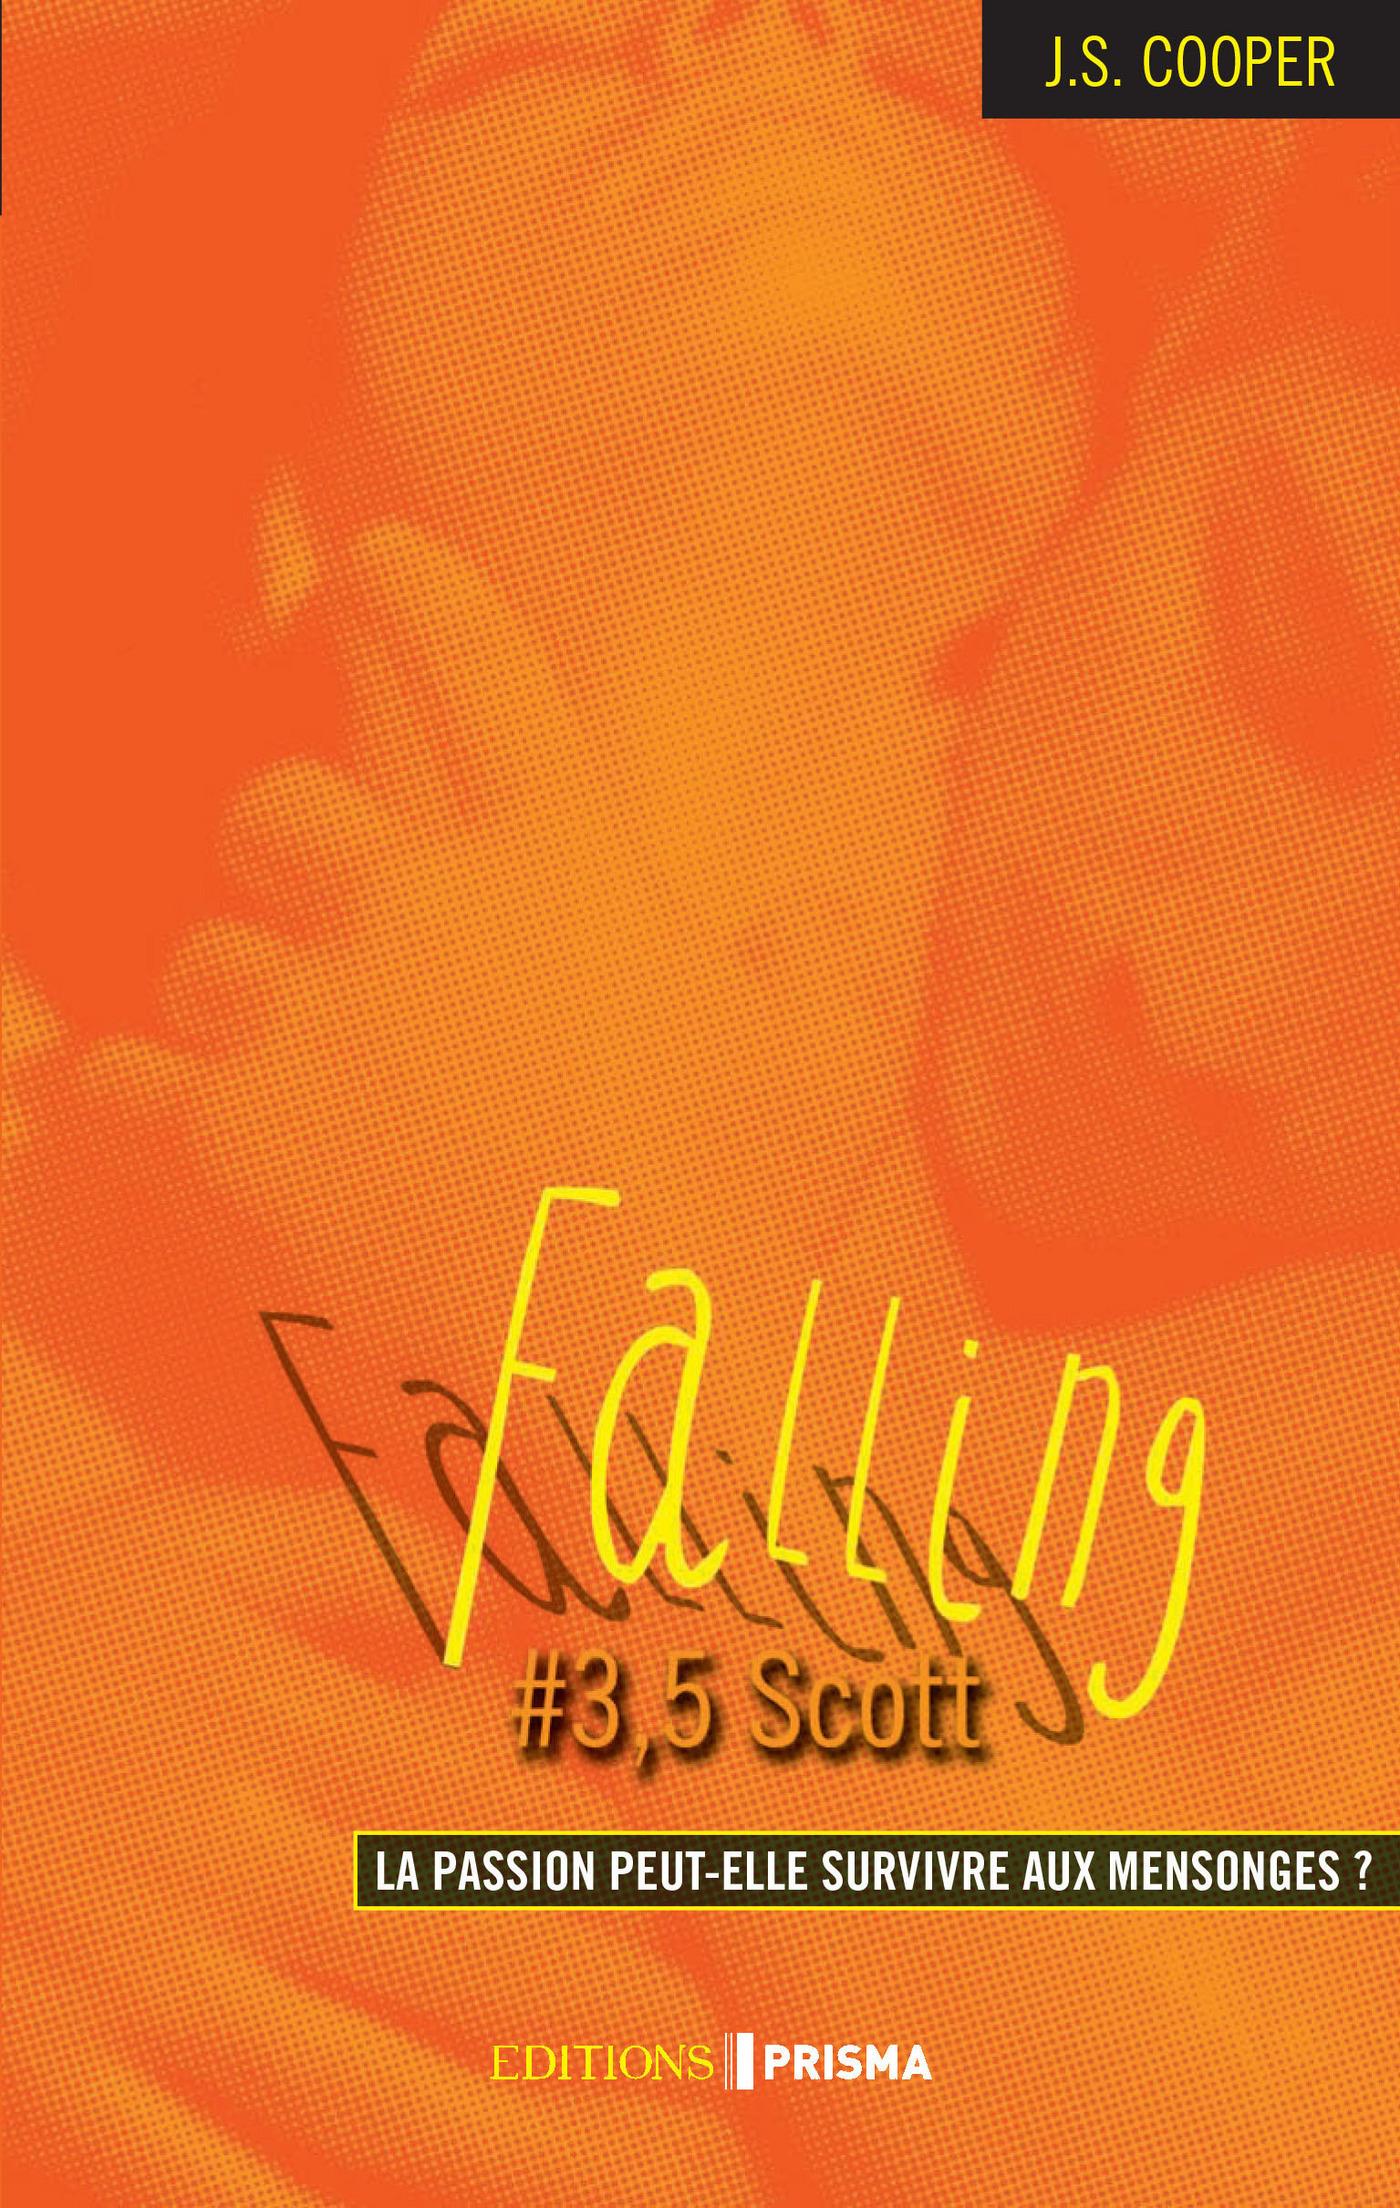 Falling #3,5 Scott